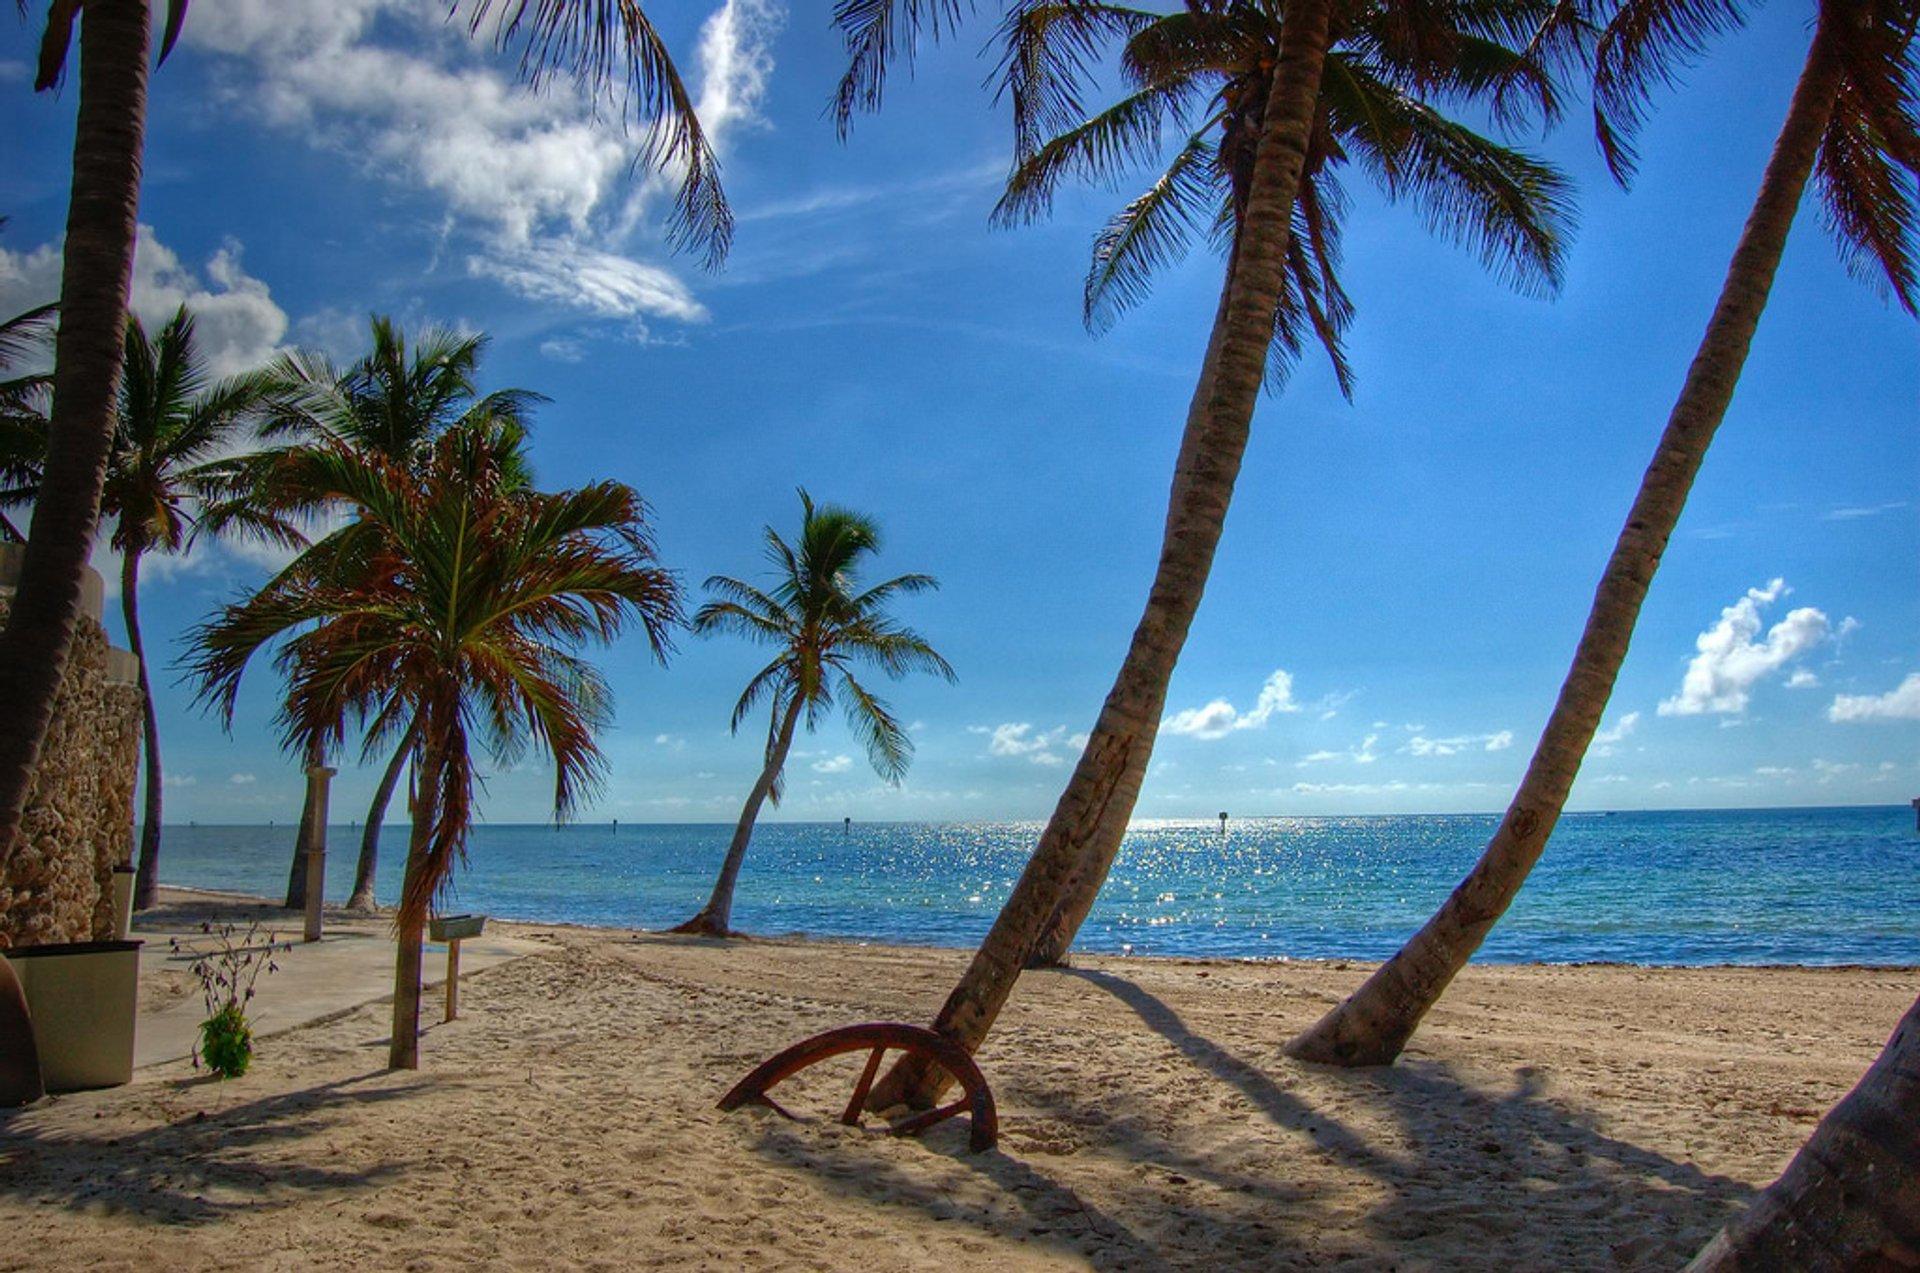 Beach Season in Florida 2019 - Best Time